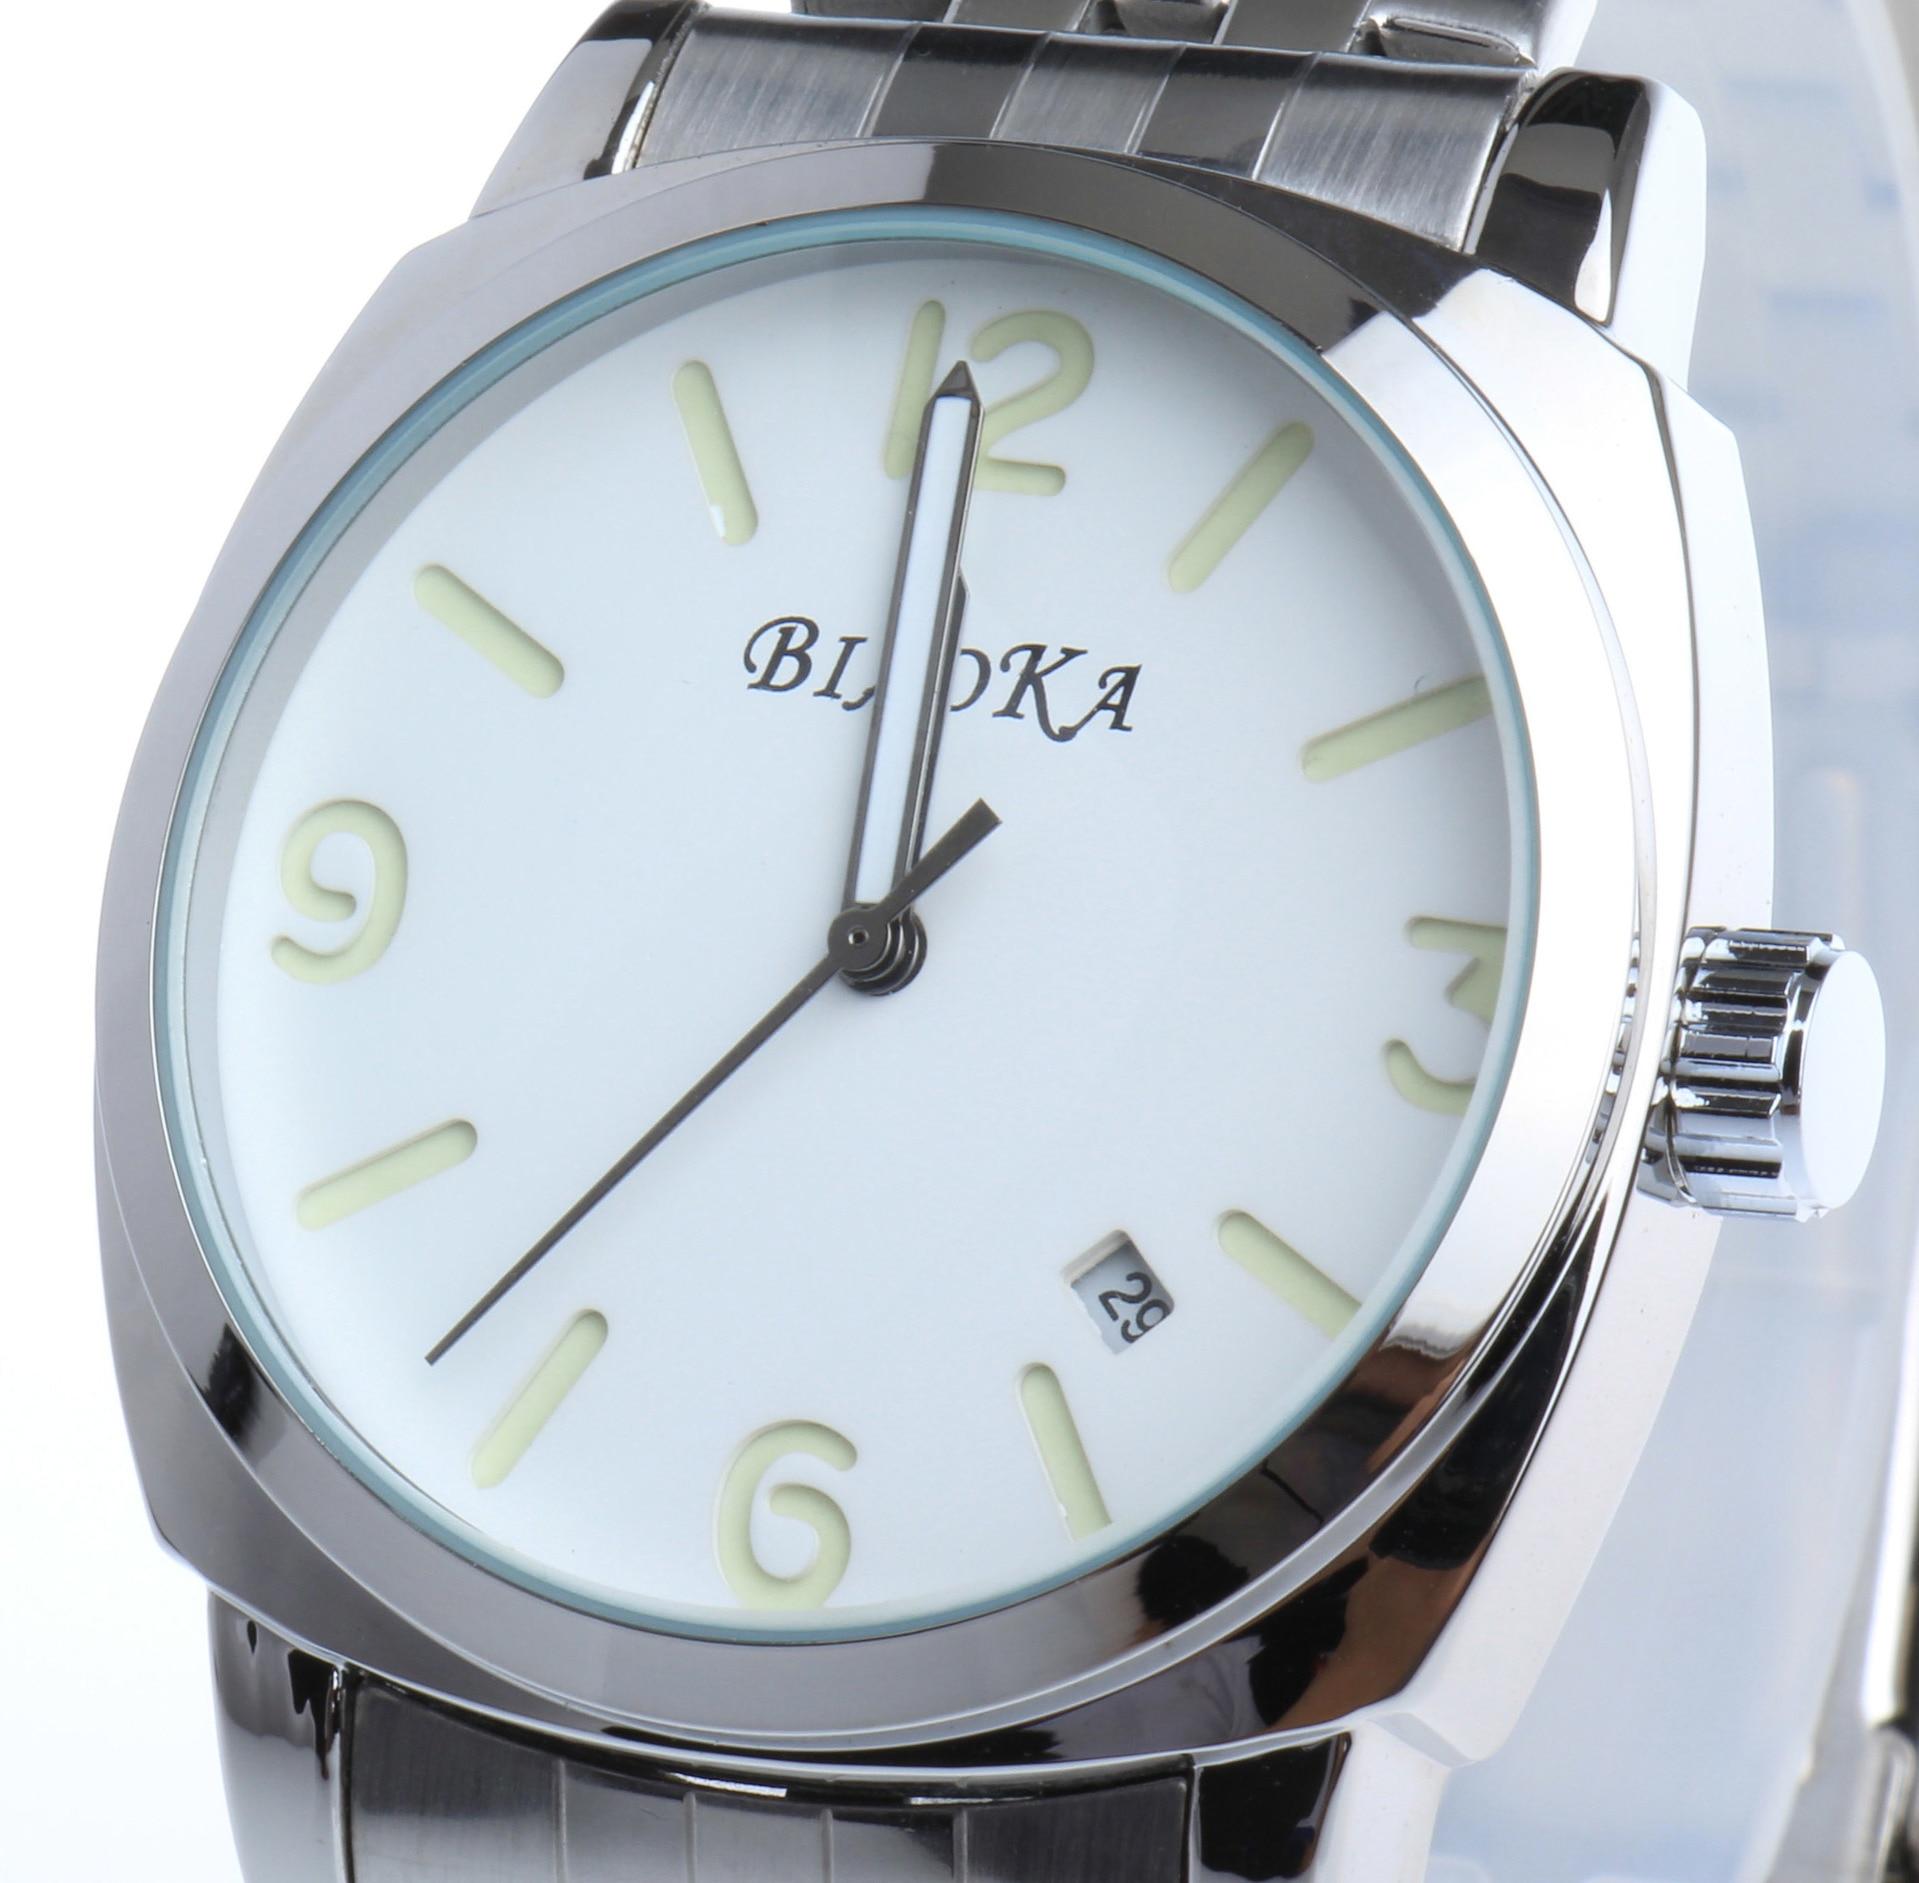 2017 New Fashion Men BIAOKA Brand Luminous Nightclubs Fashionable watch Mens Calendar Mechanical Mens Watch<br>